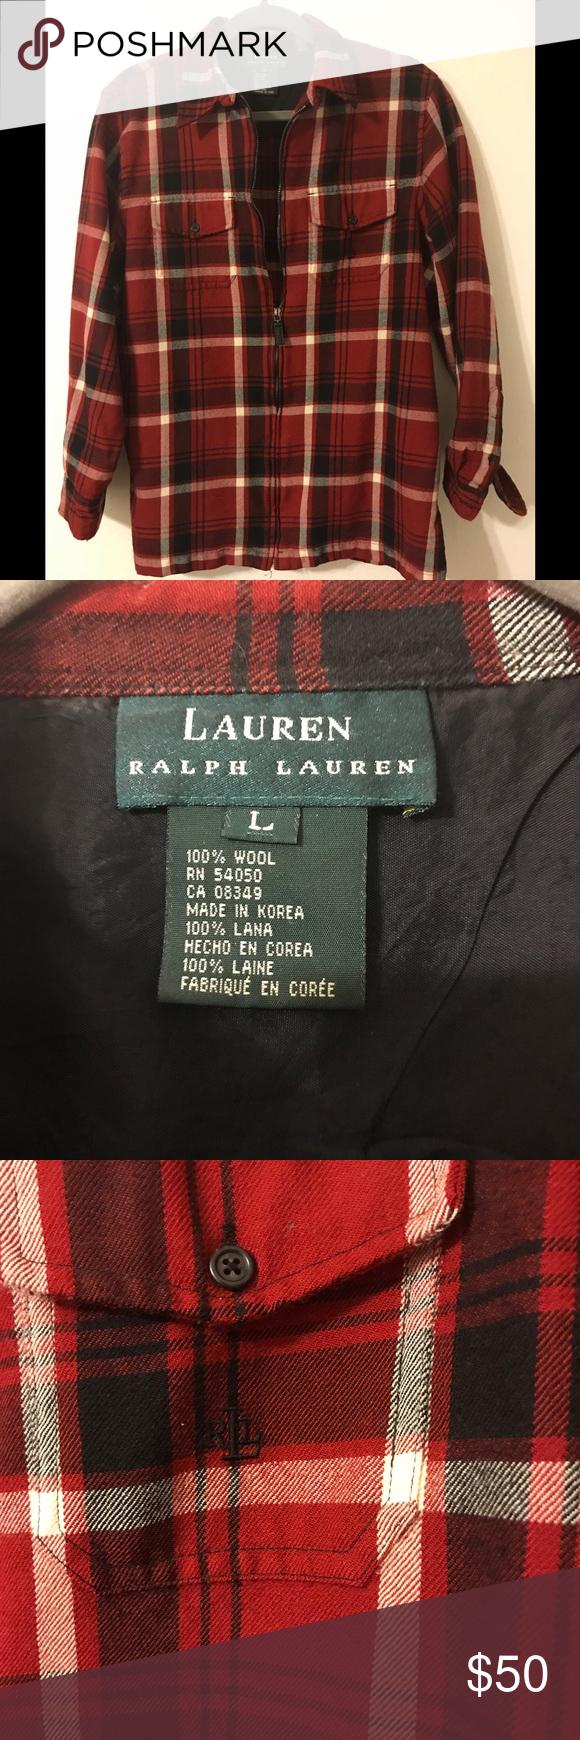 Red and black flannel cardigan  Ralph Lauren Wool Flannel  Flannels Dress shirts and Red black